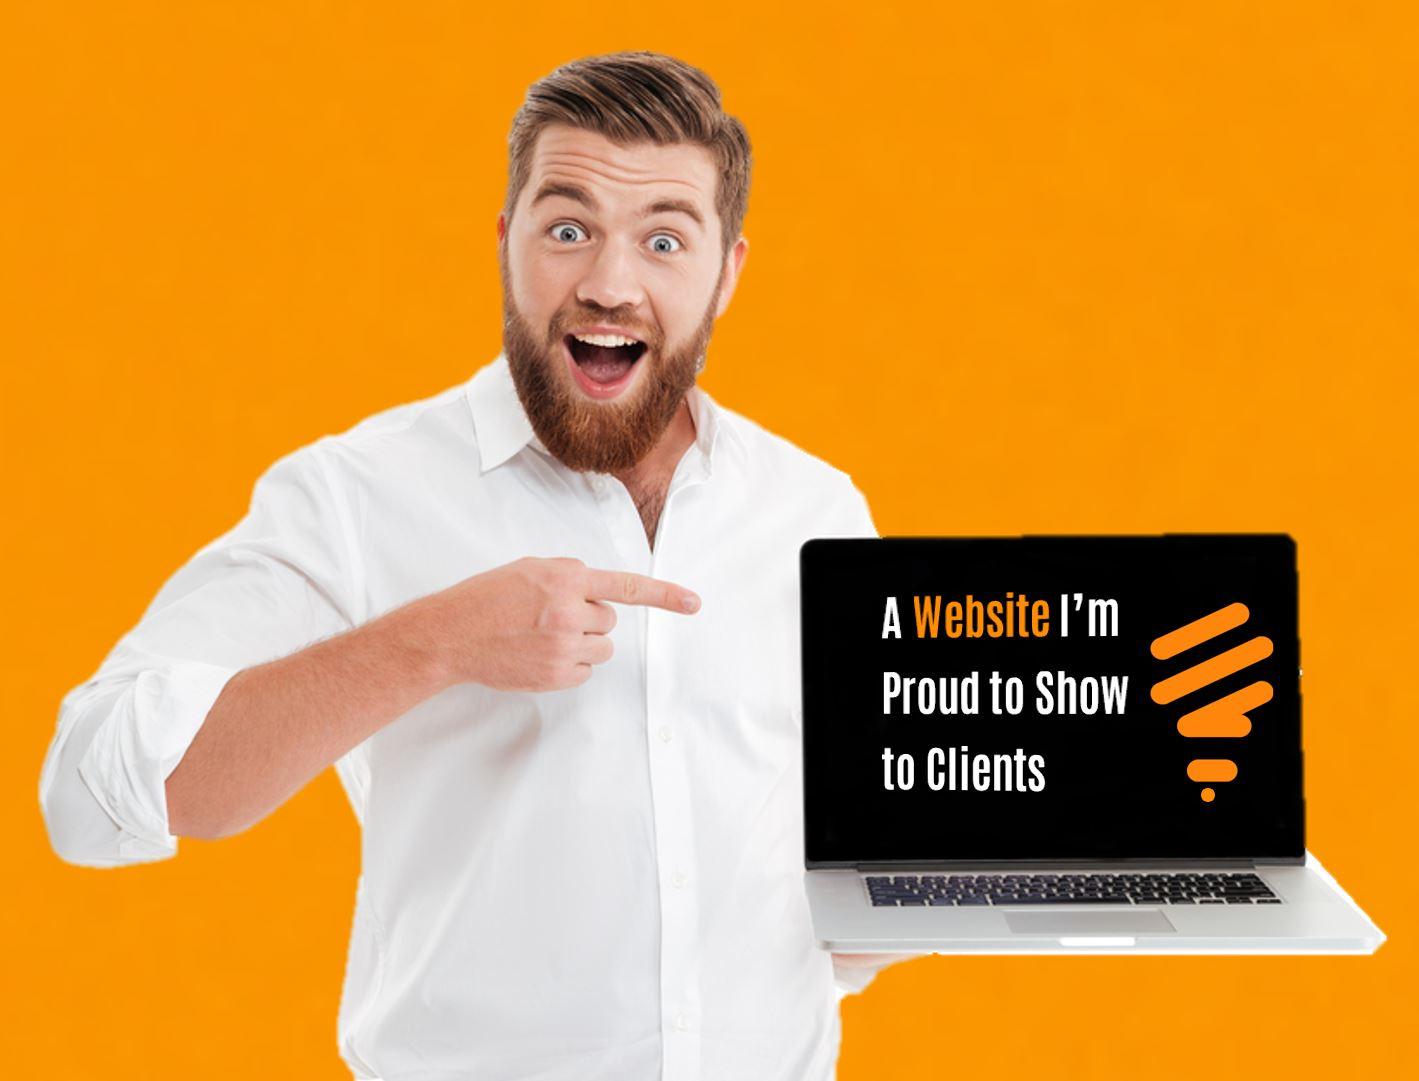 Website design you can DIY - performance, content, DIY branding - Bak